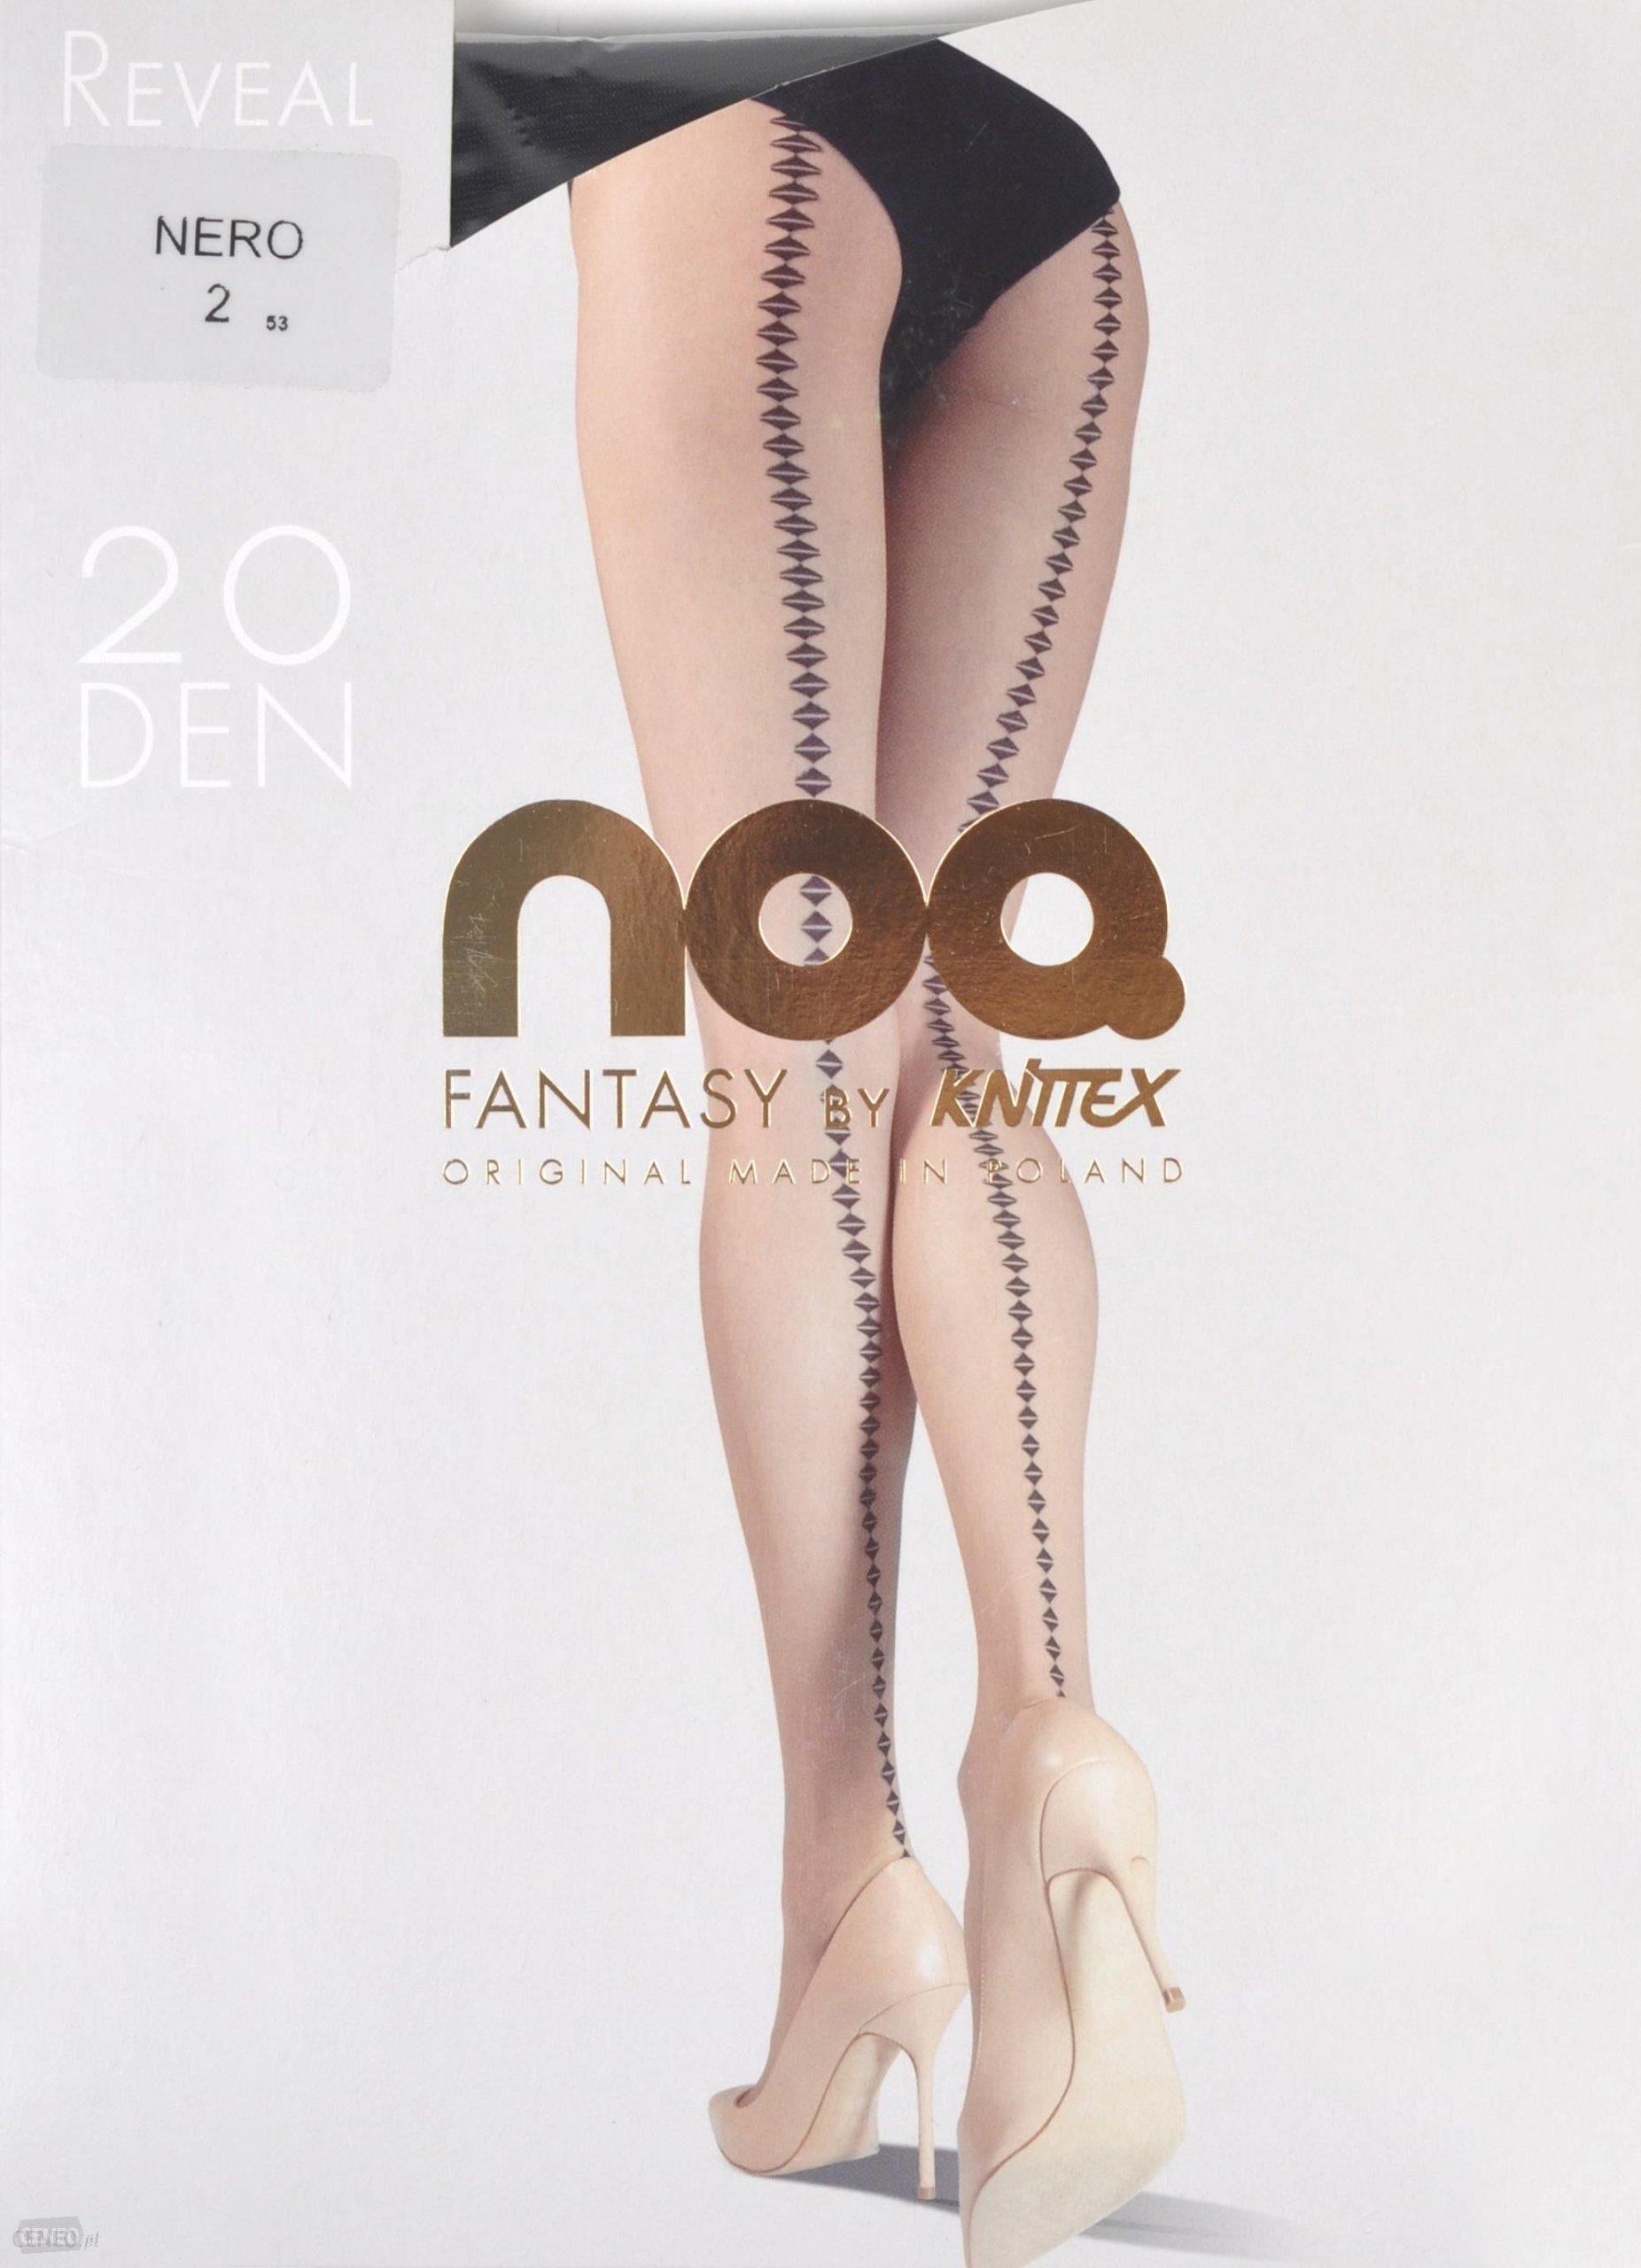 f93900e09c2bb6 Rajstopy Knittex reveal Natural/Nero 2 - Ceny i opinie - Ceneo.pl